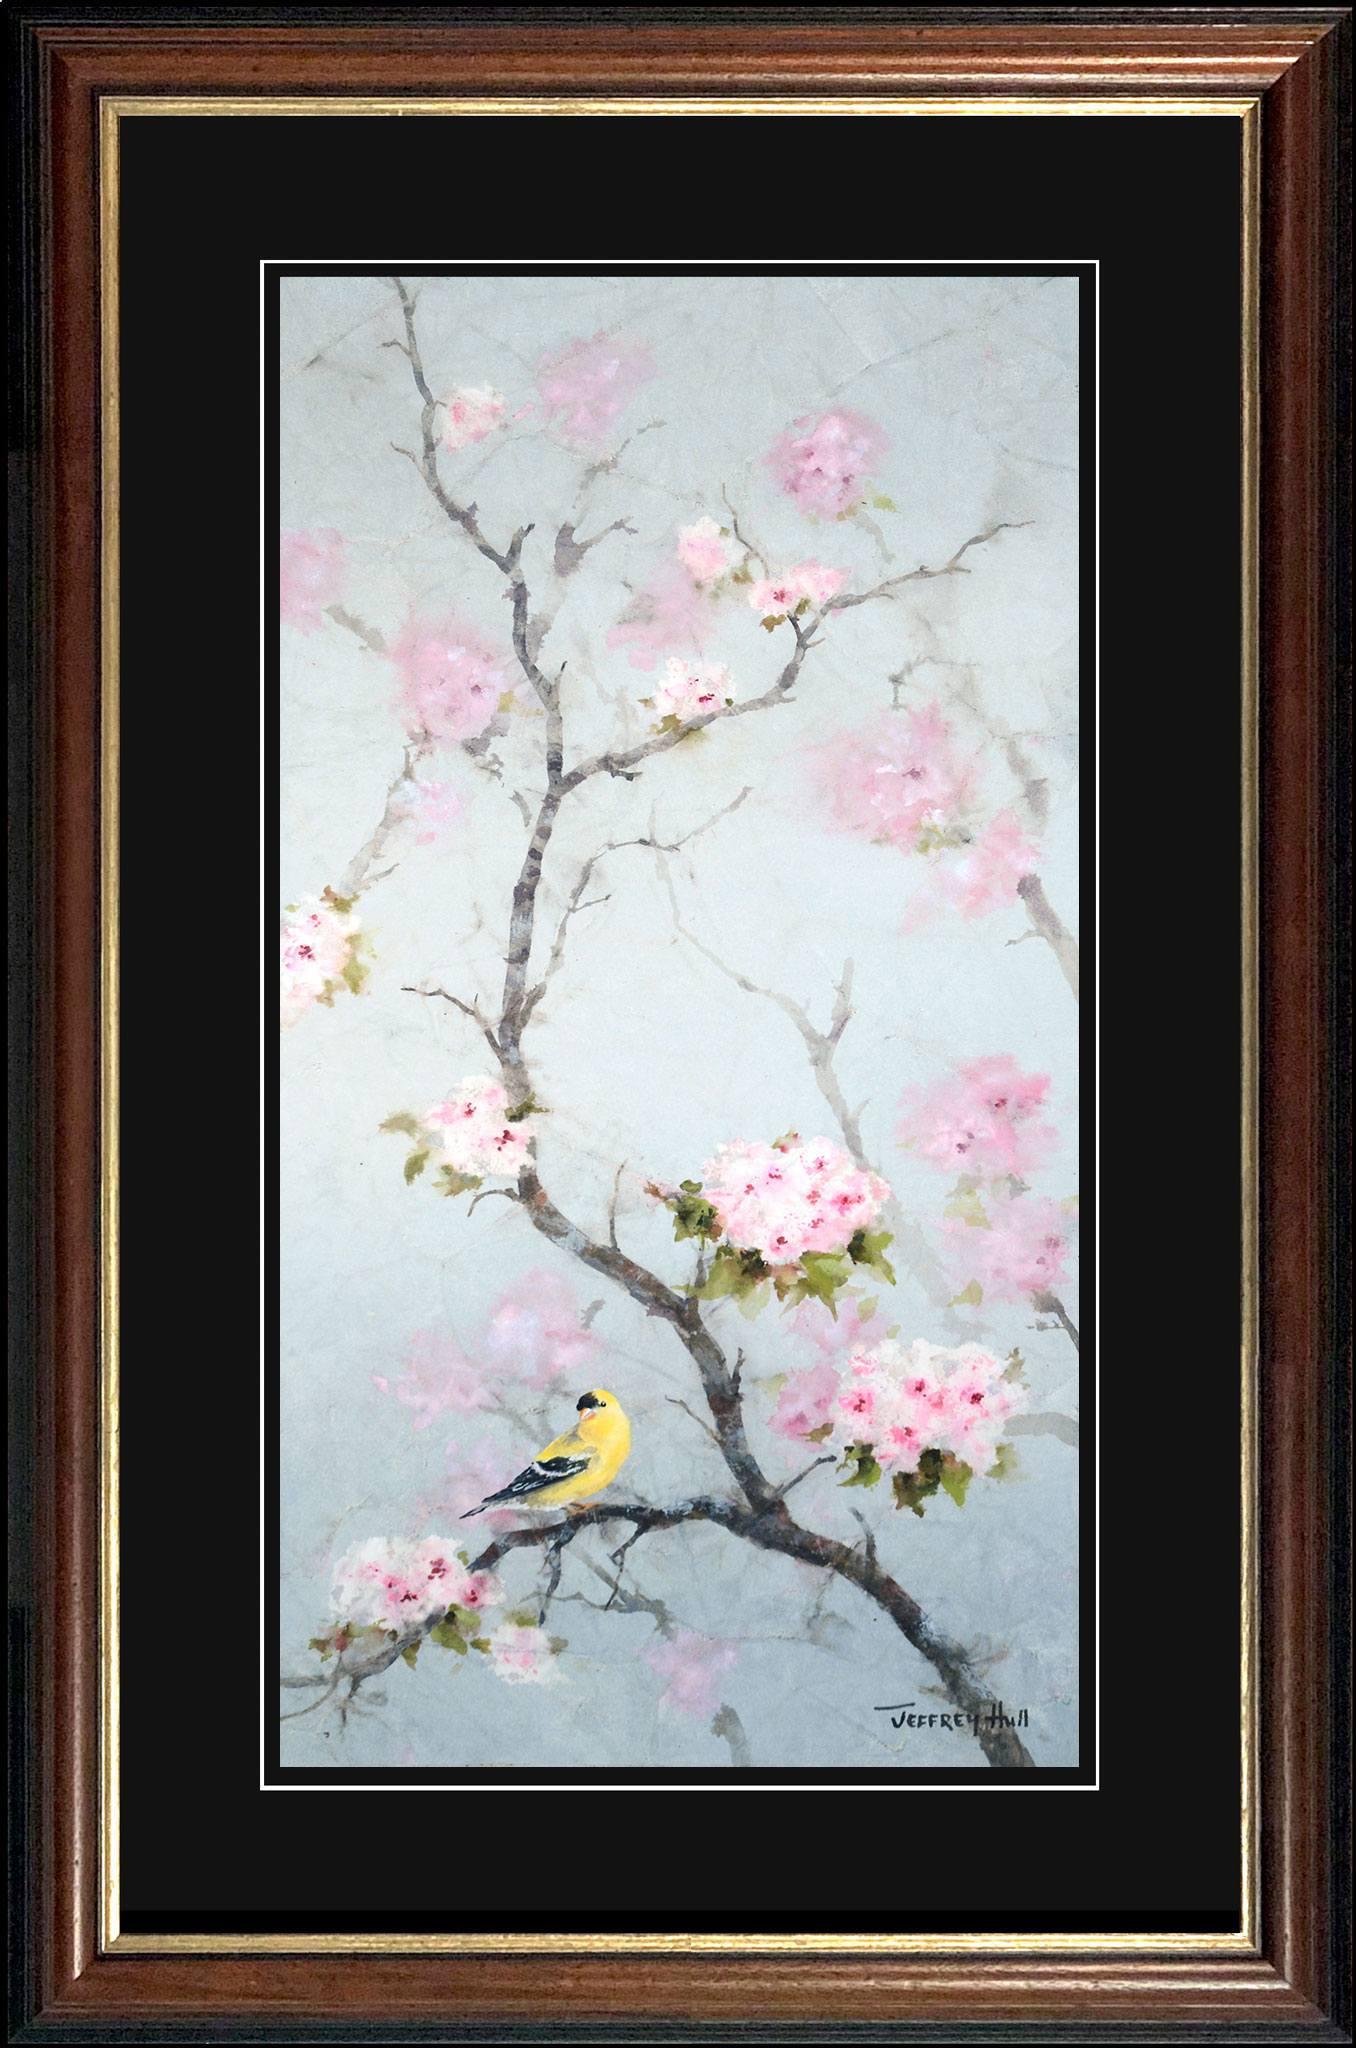 Goldfinch-_-Cherry-Blossoms-LimEd-Malabar-Jet-Black-4-Website-2021